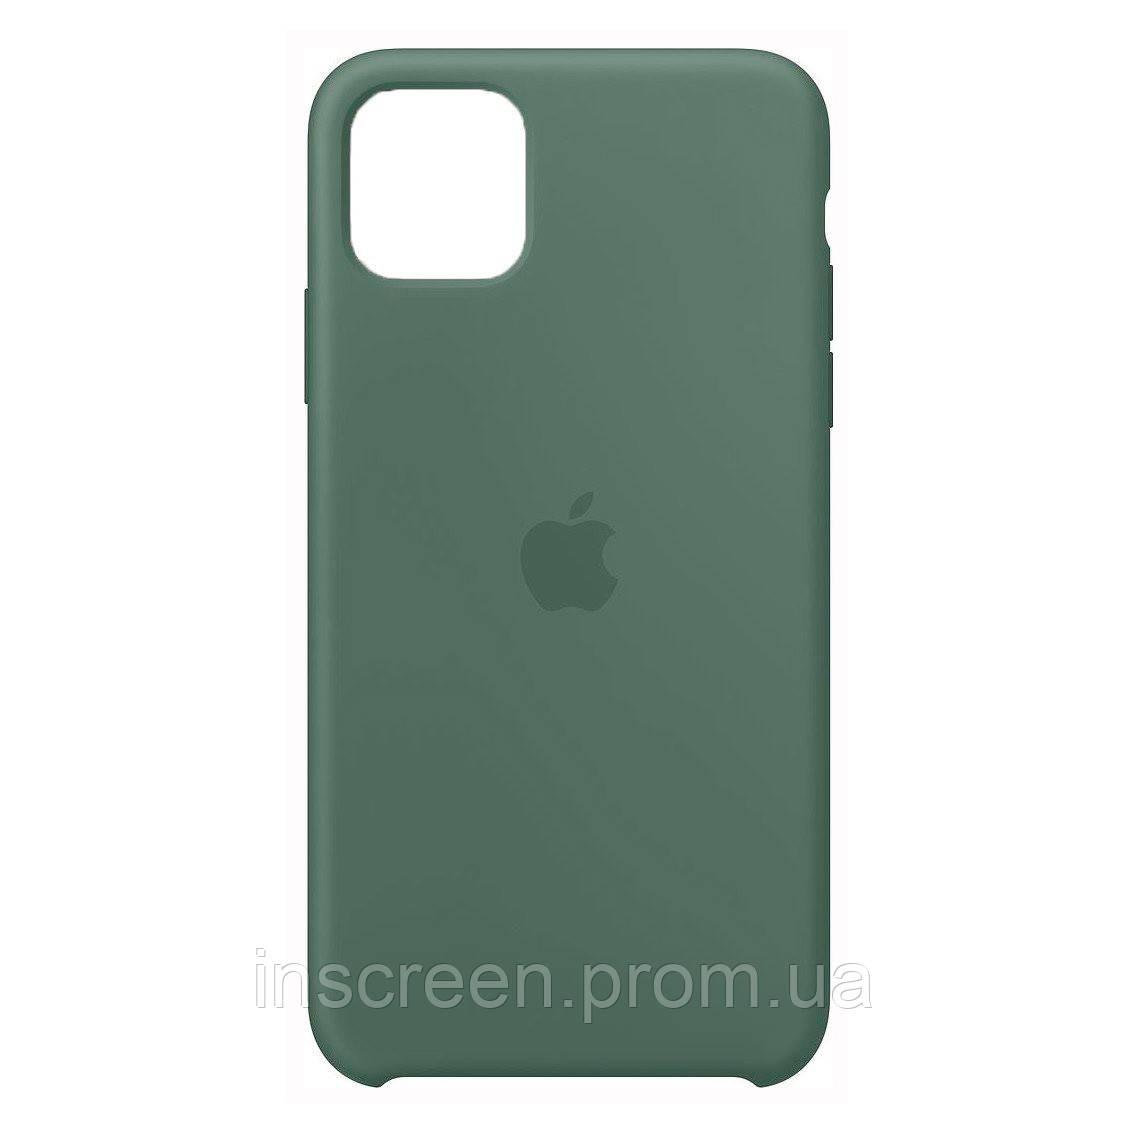 Чехол силиконовый Silicone Case для Apple iPhone 12 Mini Dark Olive